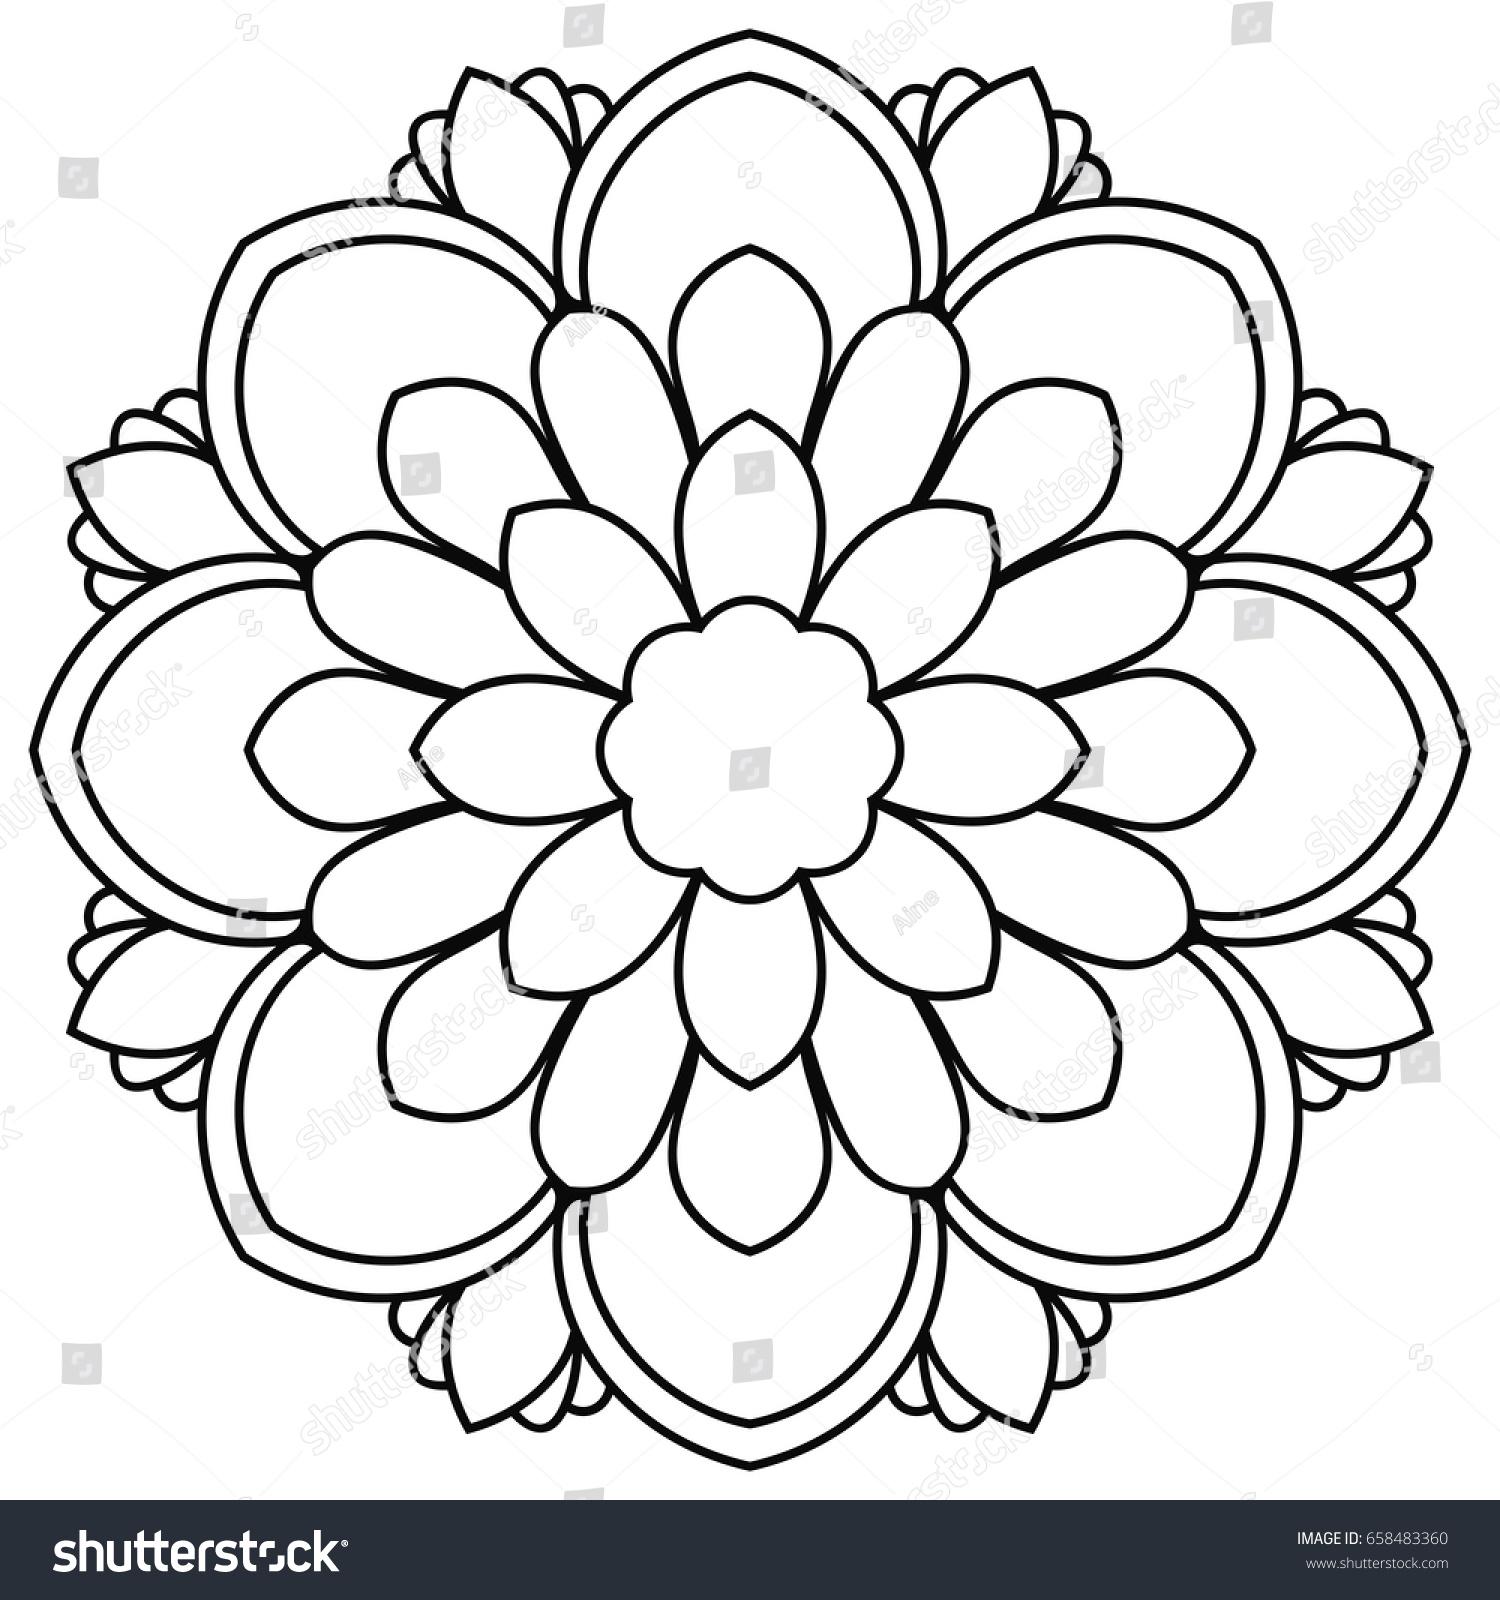 Indian Symbol For Balance